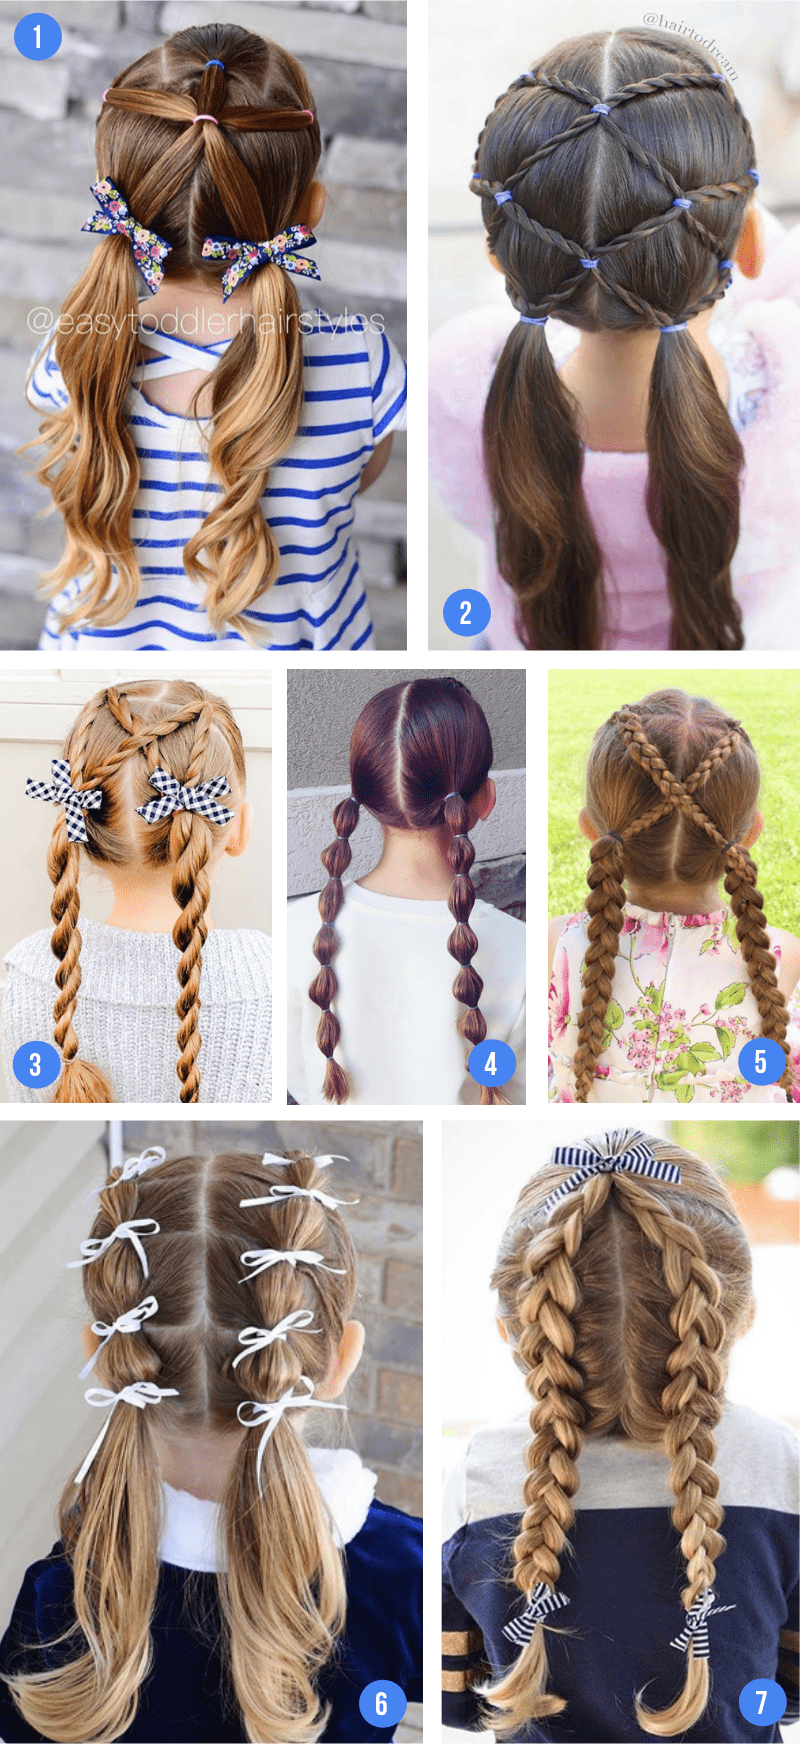 Easy Girls Hairstyles For Toddlers, Tweens & Teens - what moms love